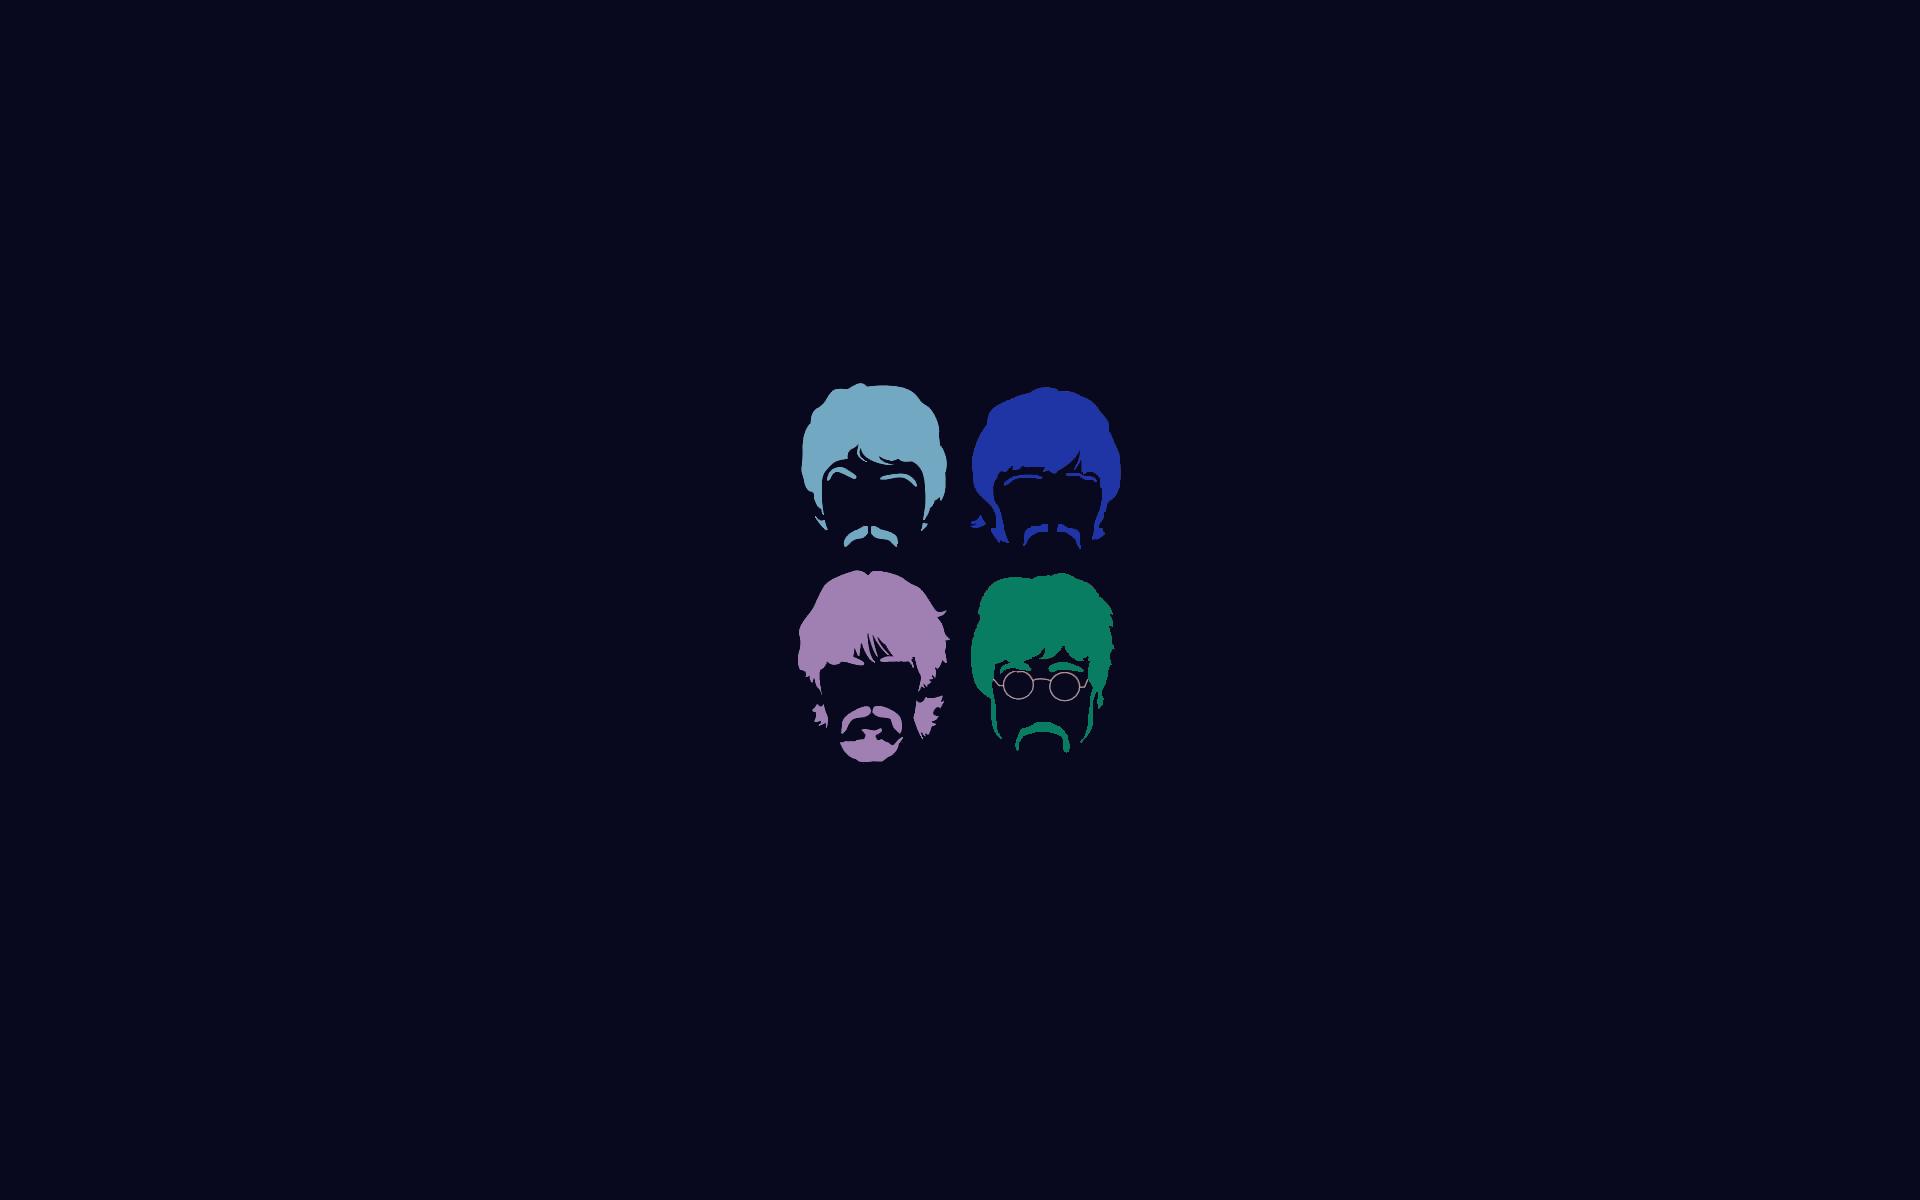 The Beatles Papel De Parede Hd Plano De Fundo 1920x1200 Id